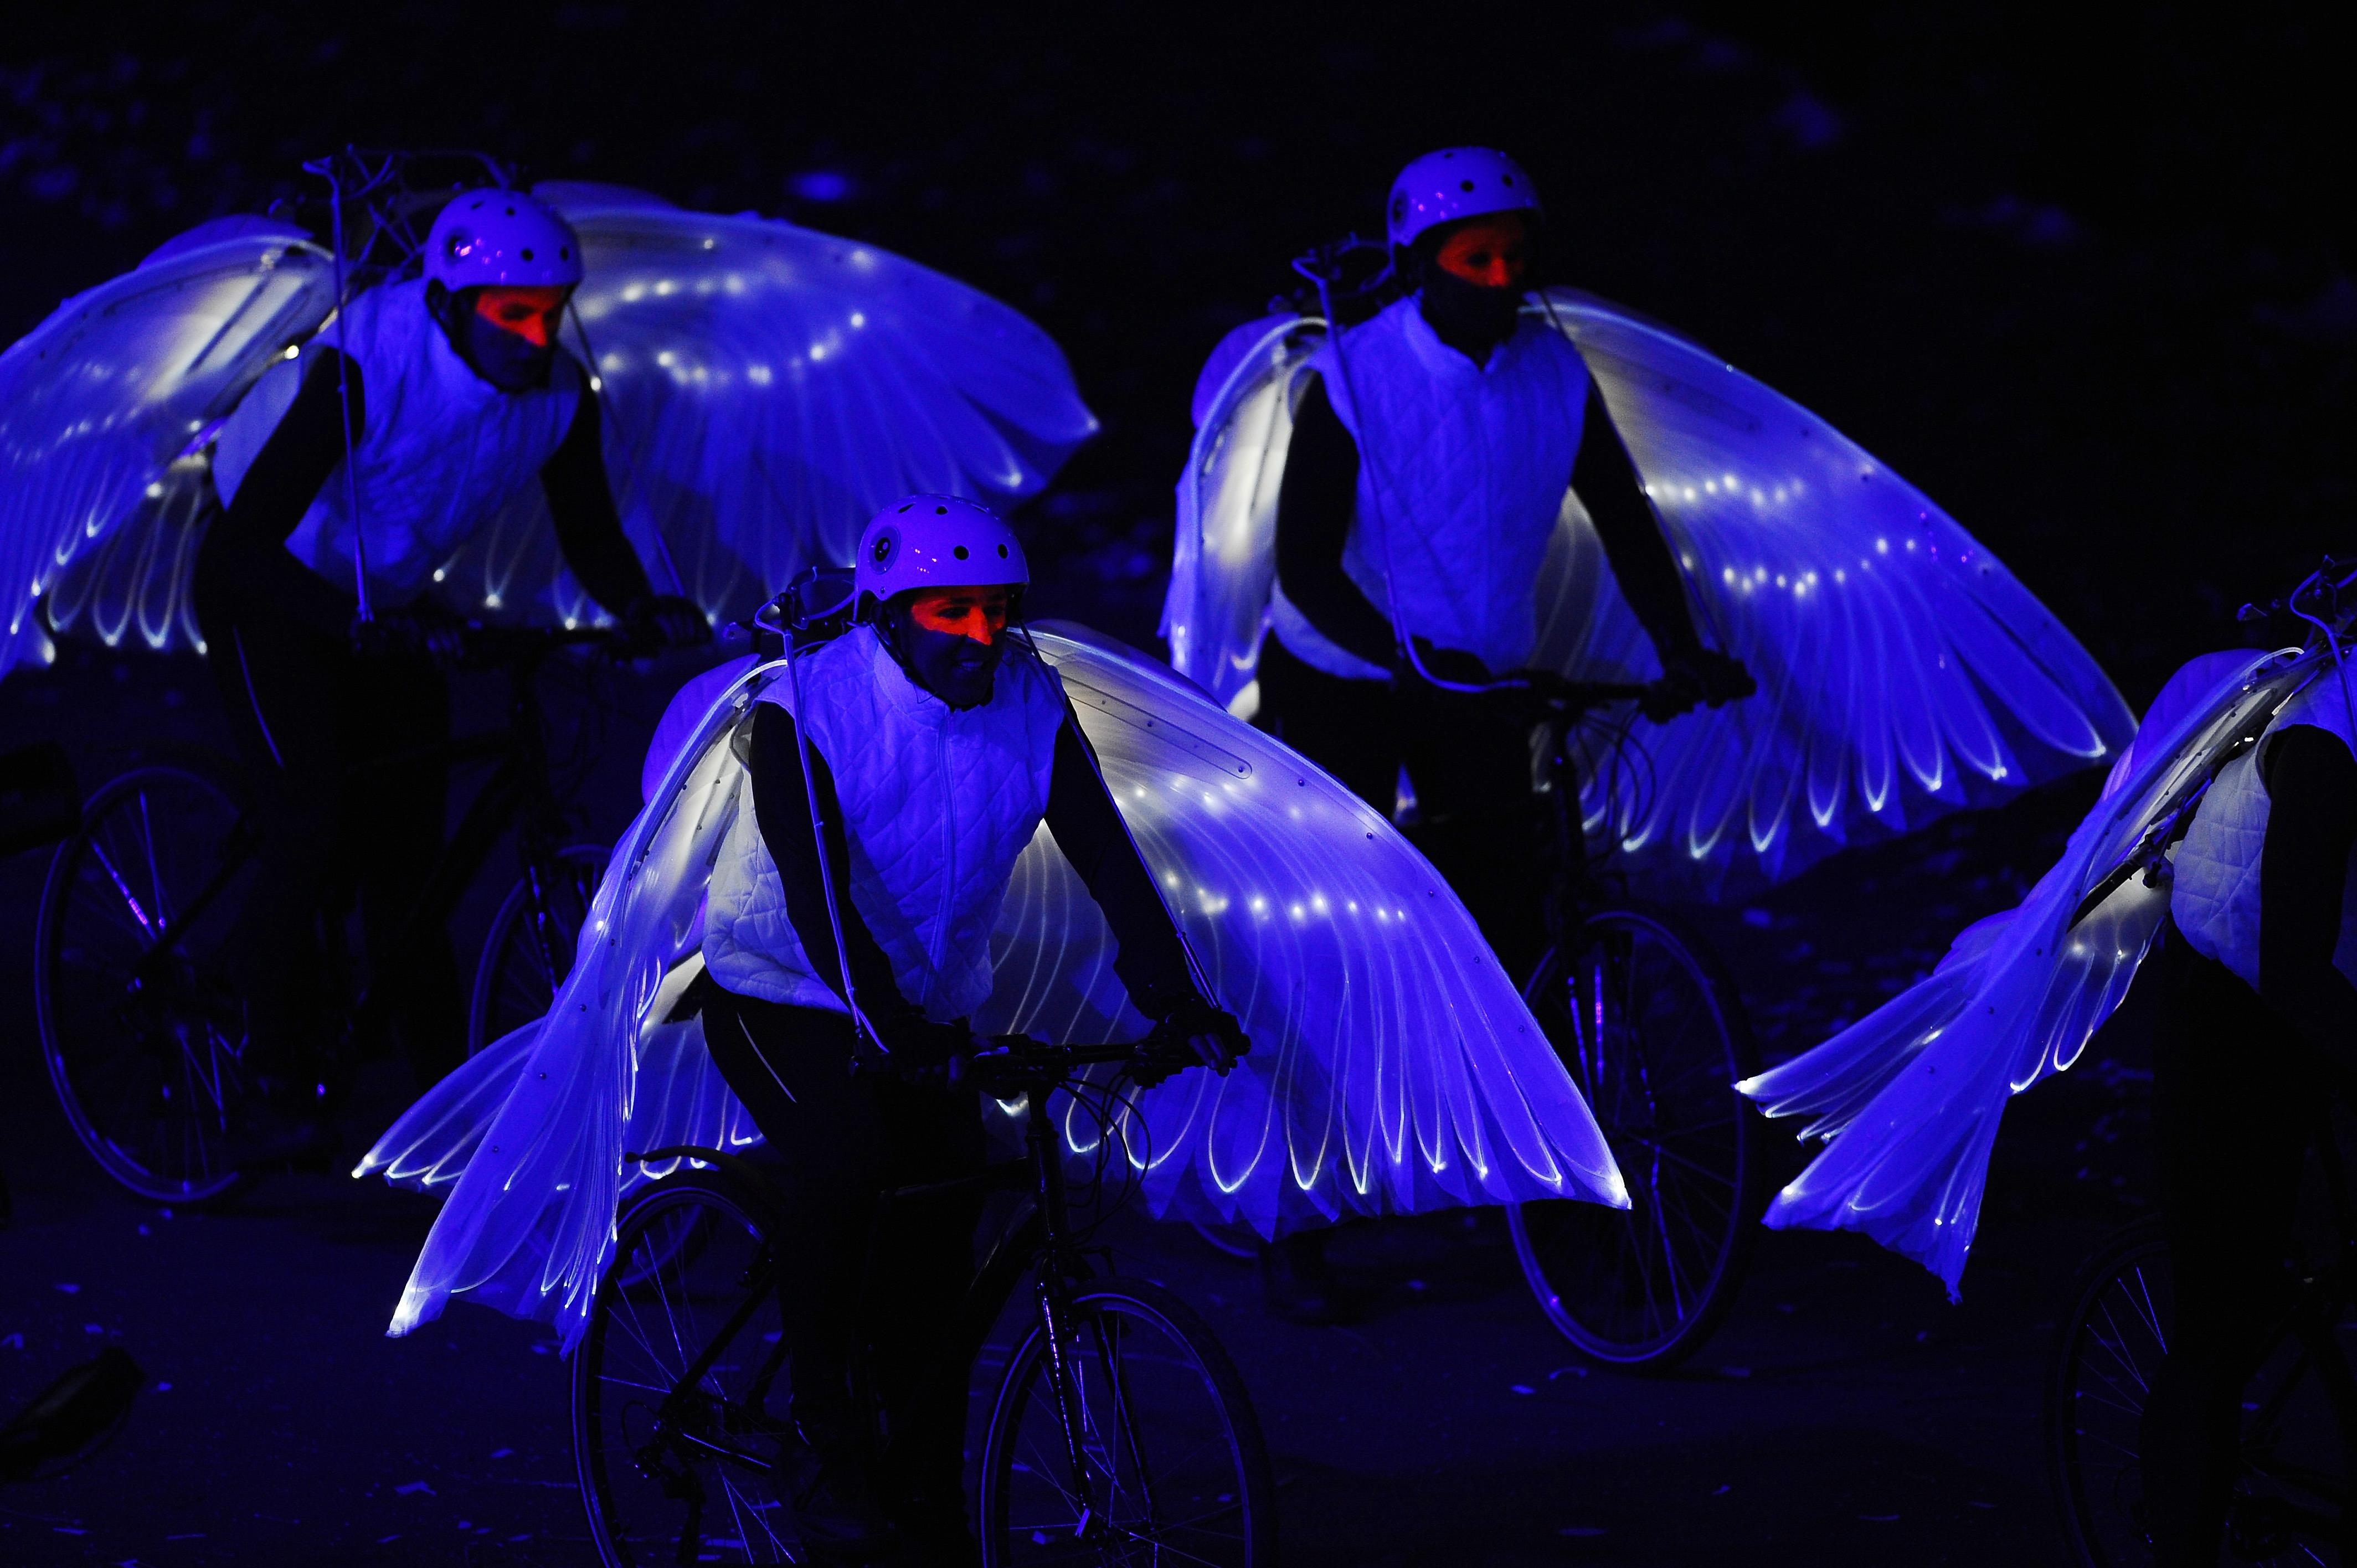 2012 Olympics Opening Ceremony- Doves